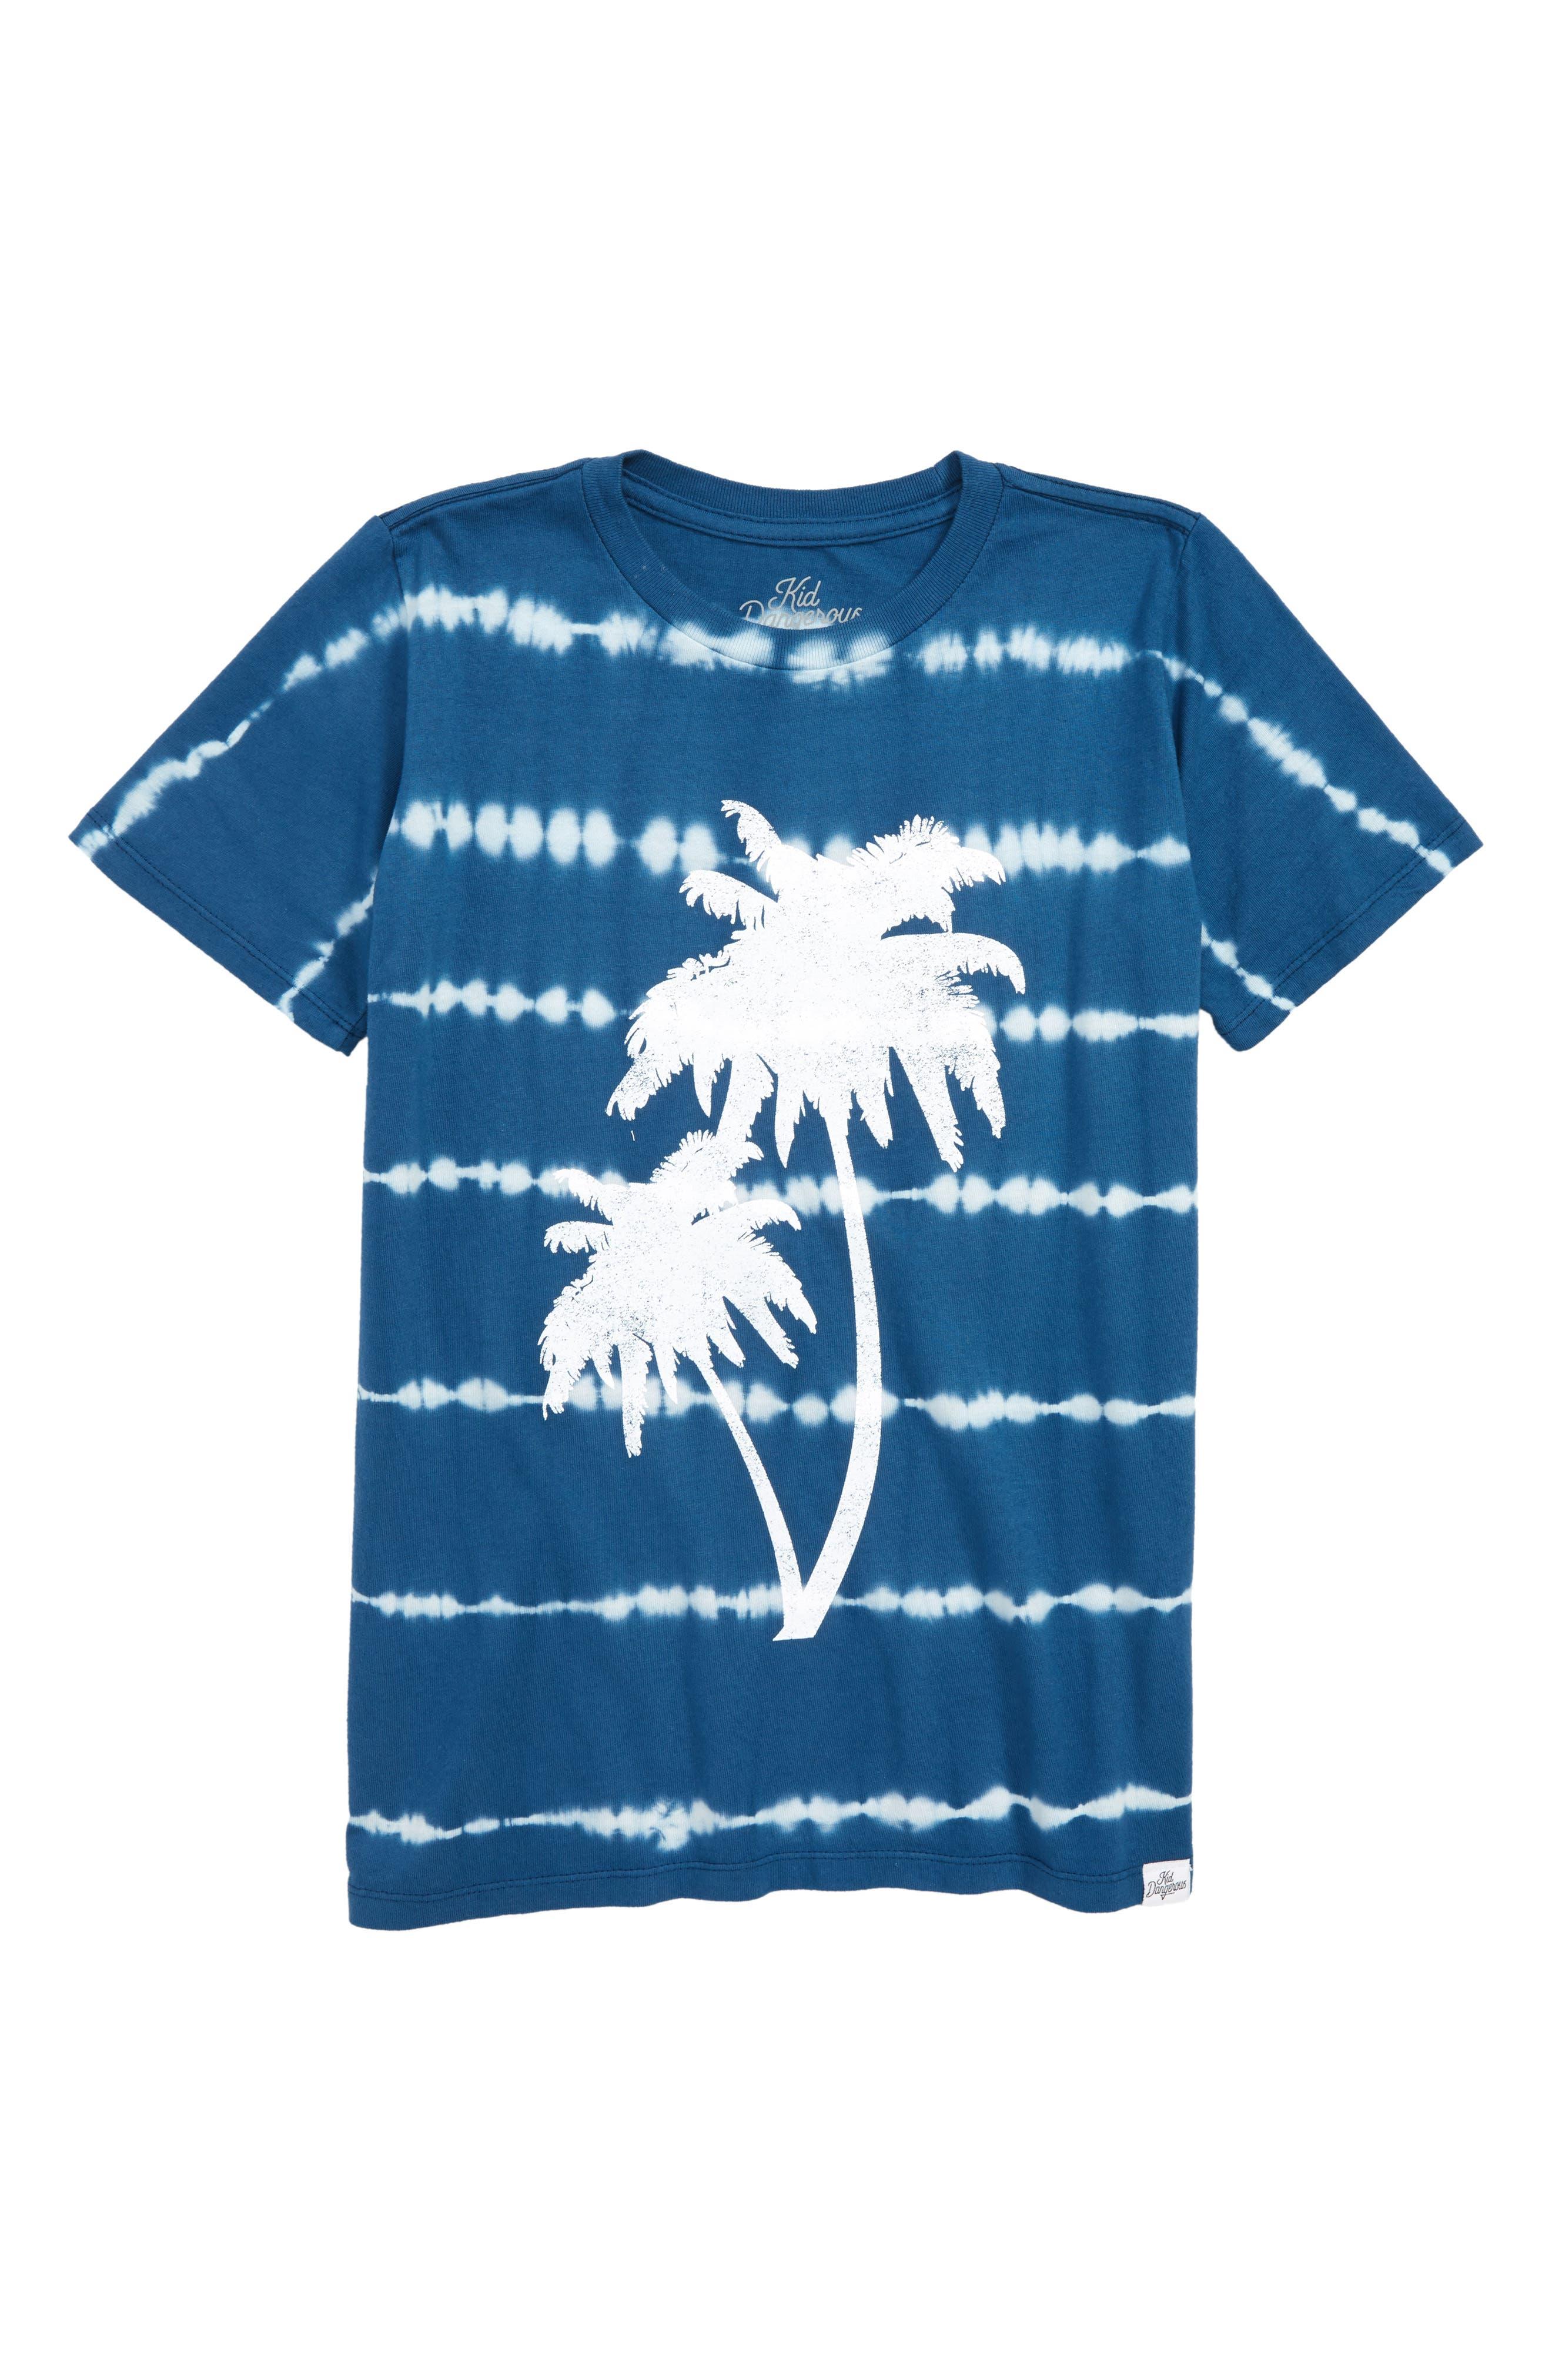 Palm Trees T-Shirt,                             Main thumbnail 1, color,                             410